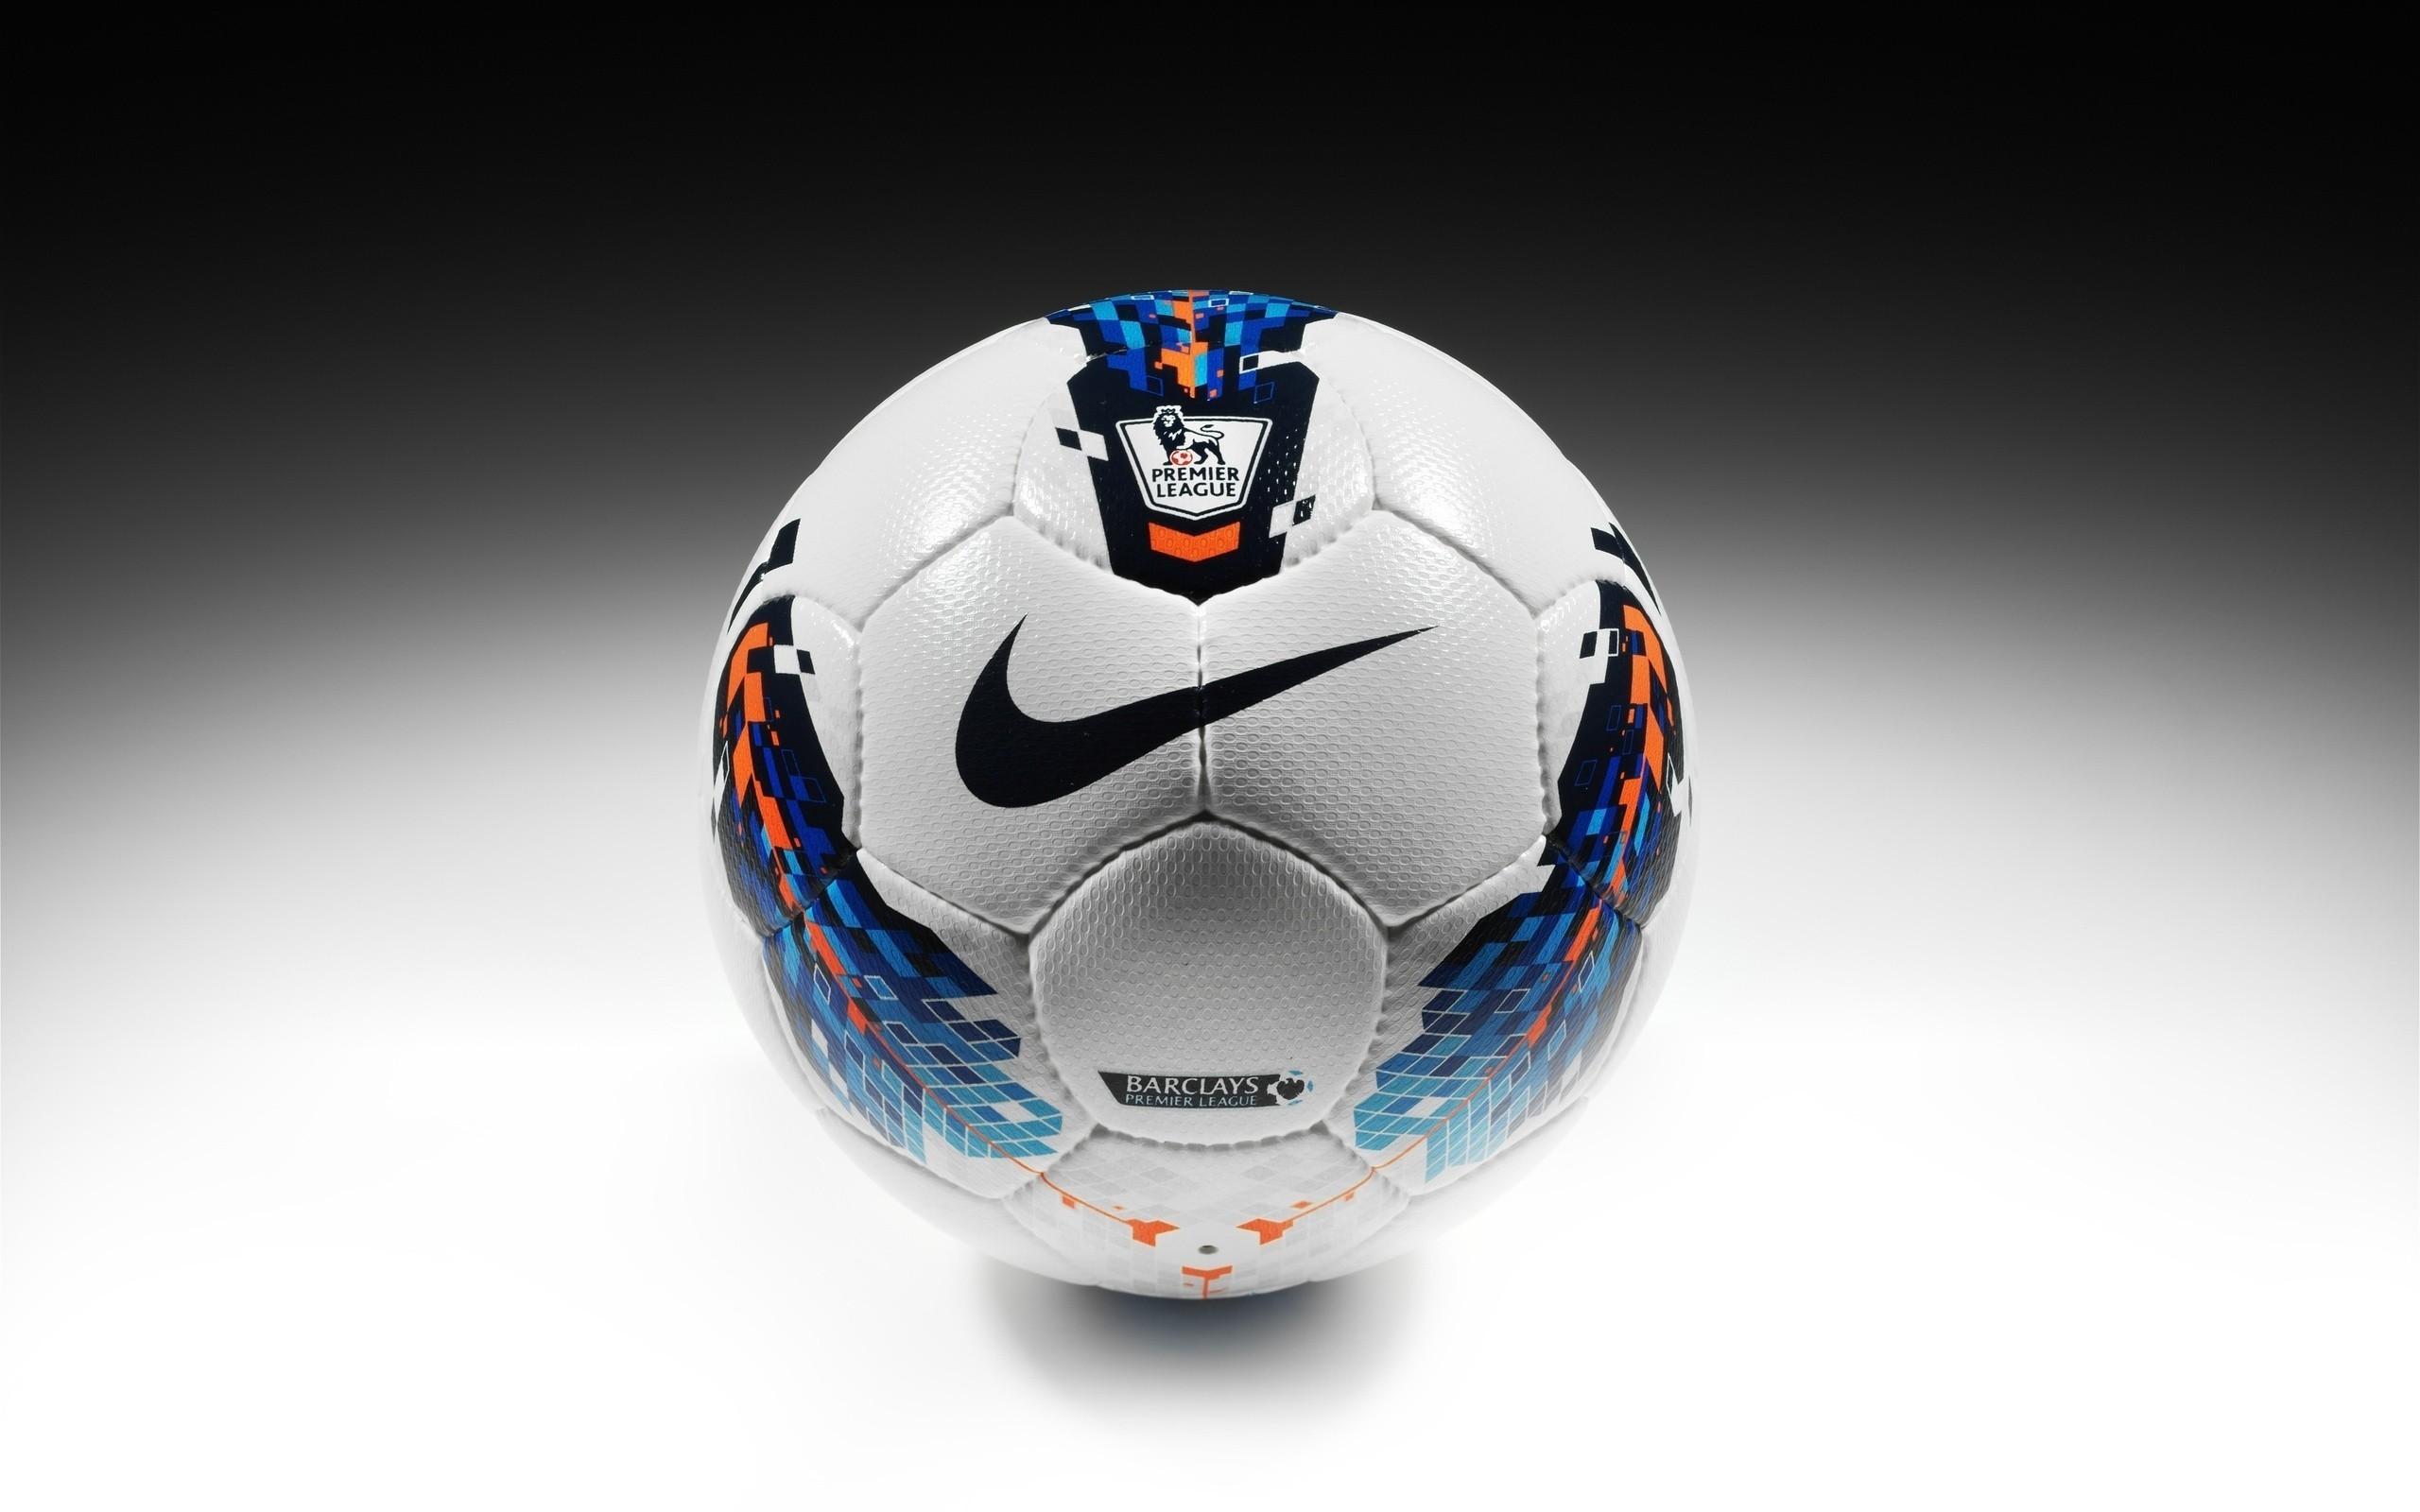 мяч спорт EURO 2016 adidas  № 3918562 бесплатно